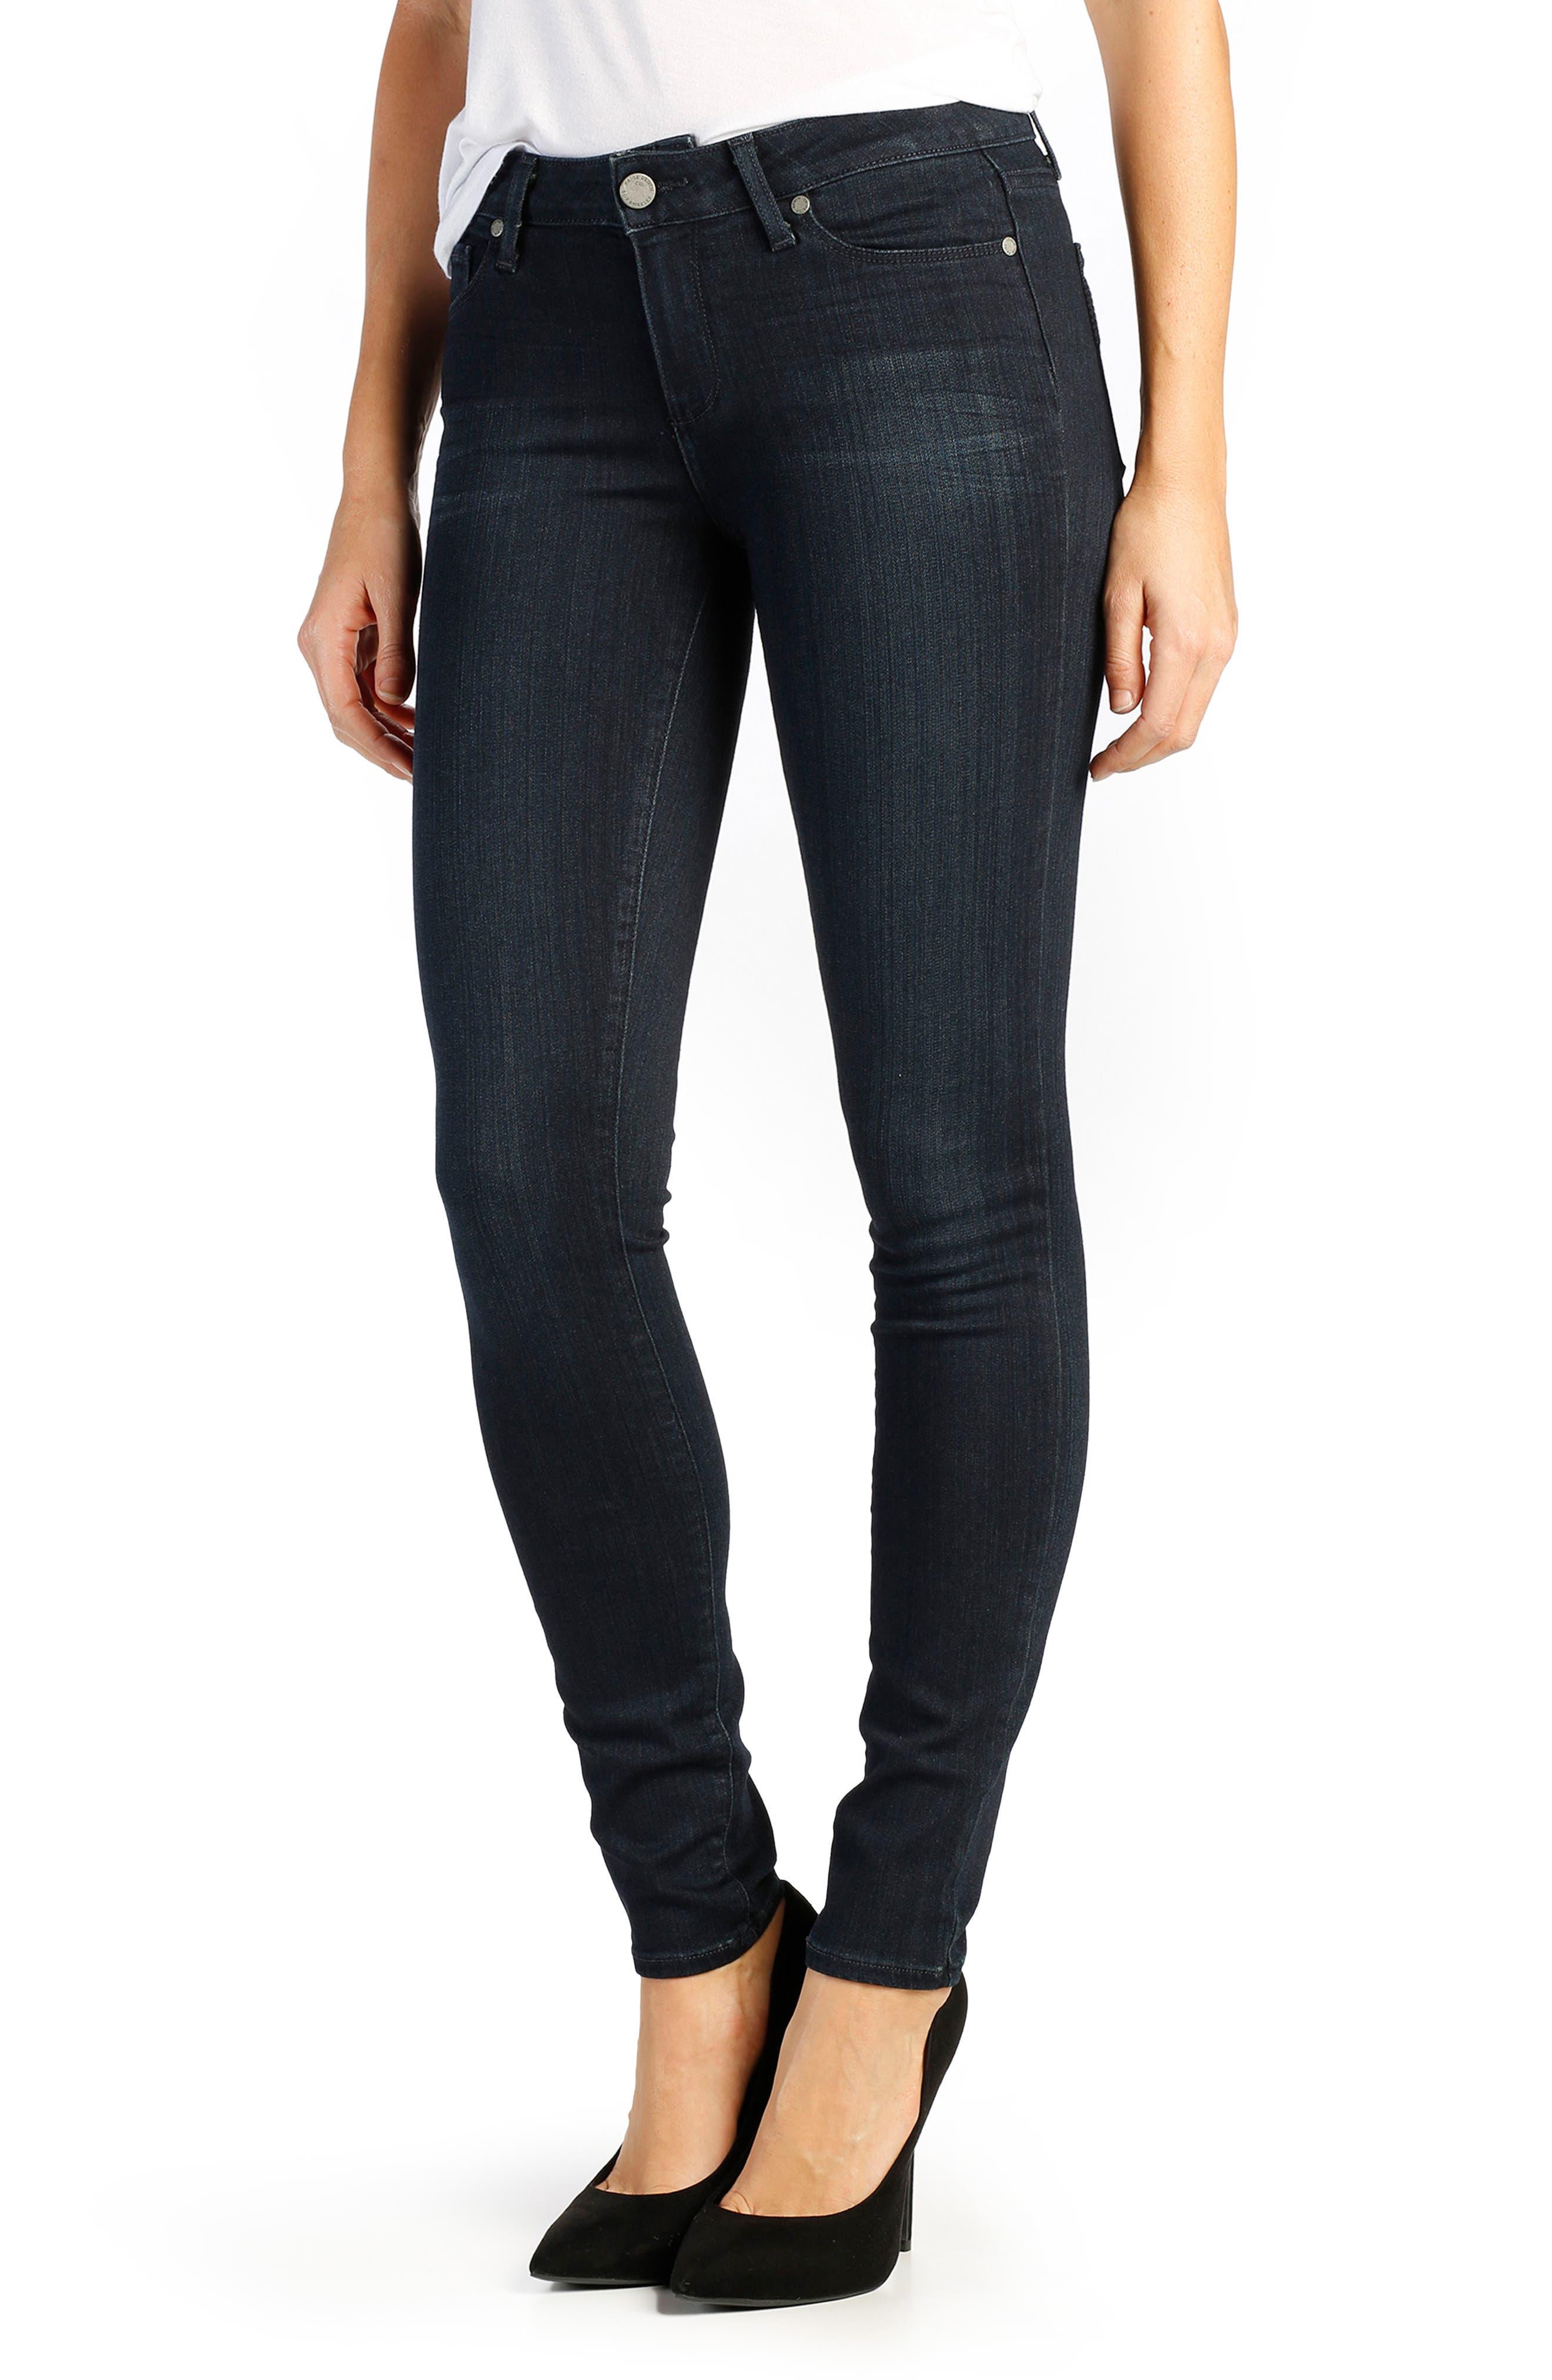 Alternate Image 1 Selected - PAIGE Transcend - Verdugo Ultra Skinny Jeans (Total Mona)